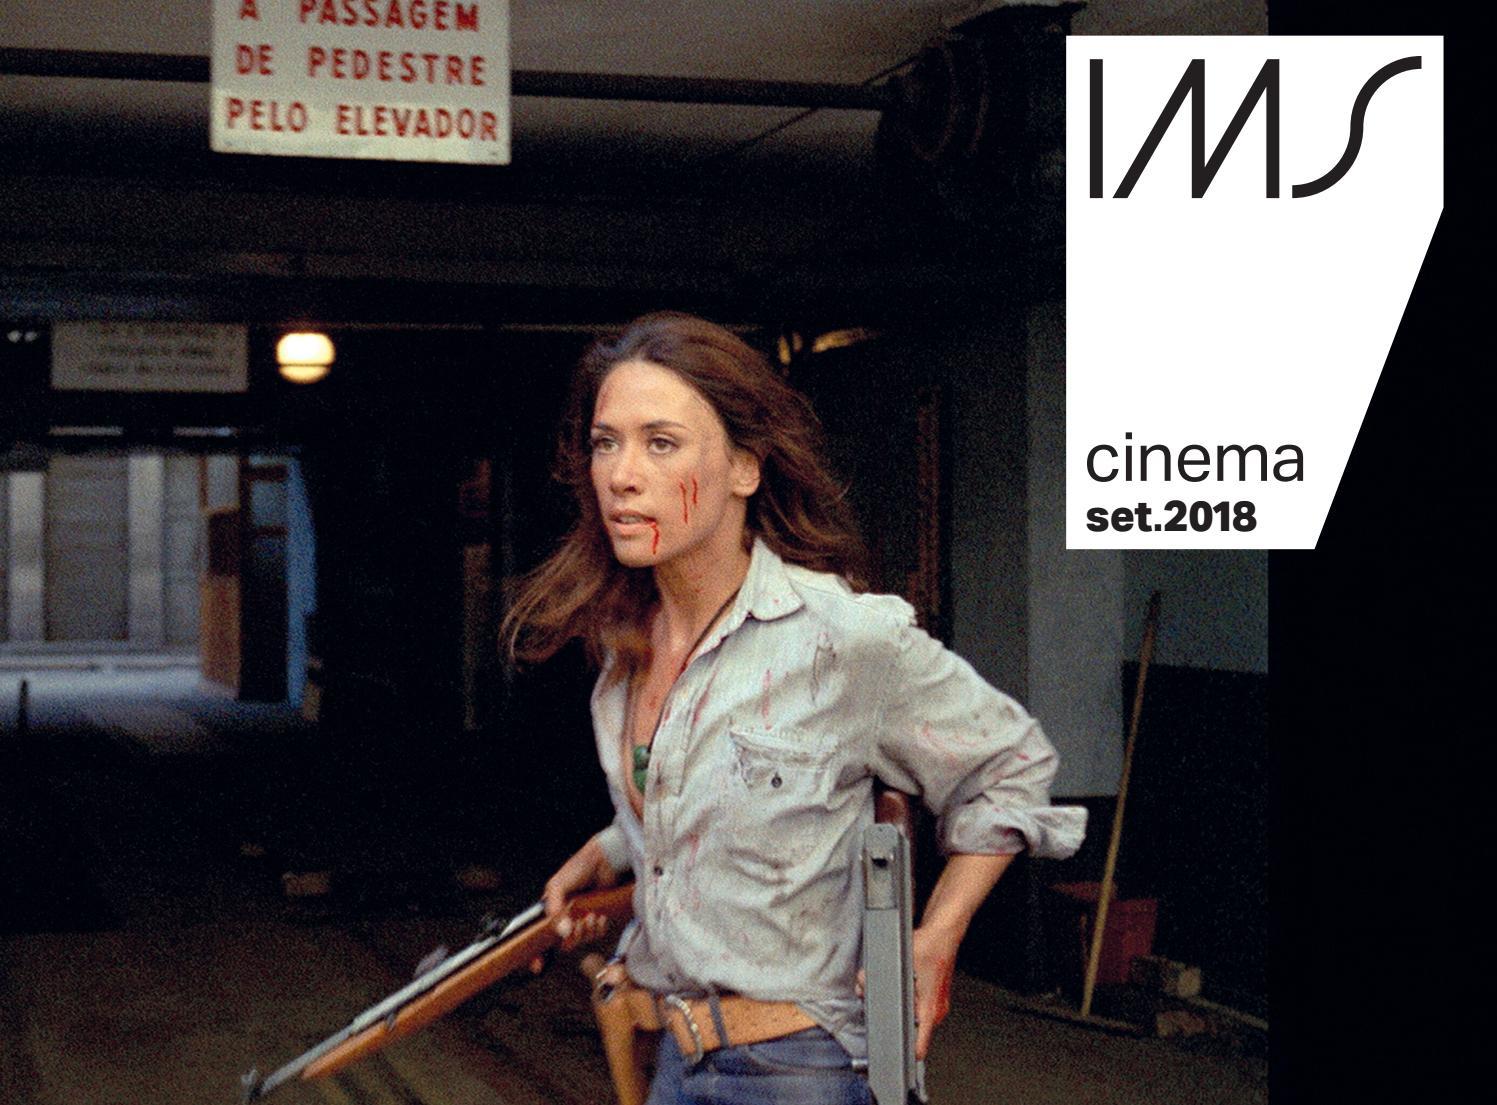 Ims Paulista Os Filmes De Setembro2018 By Instituto Moreira Salles